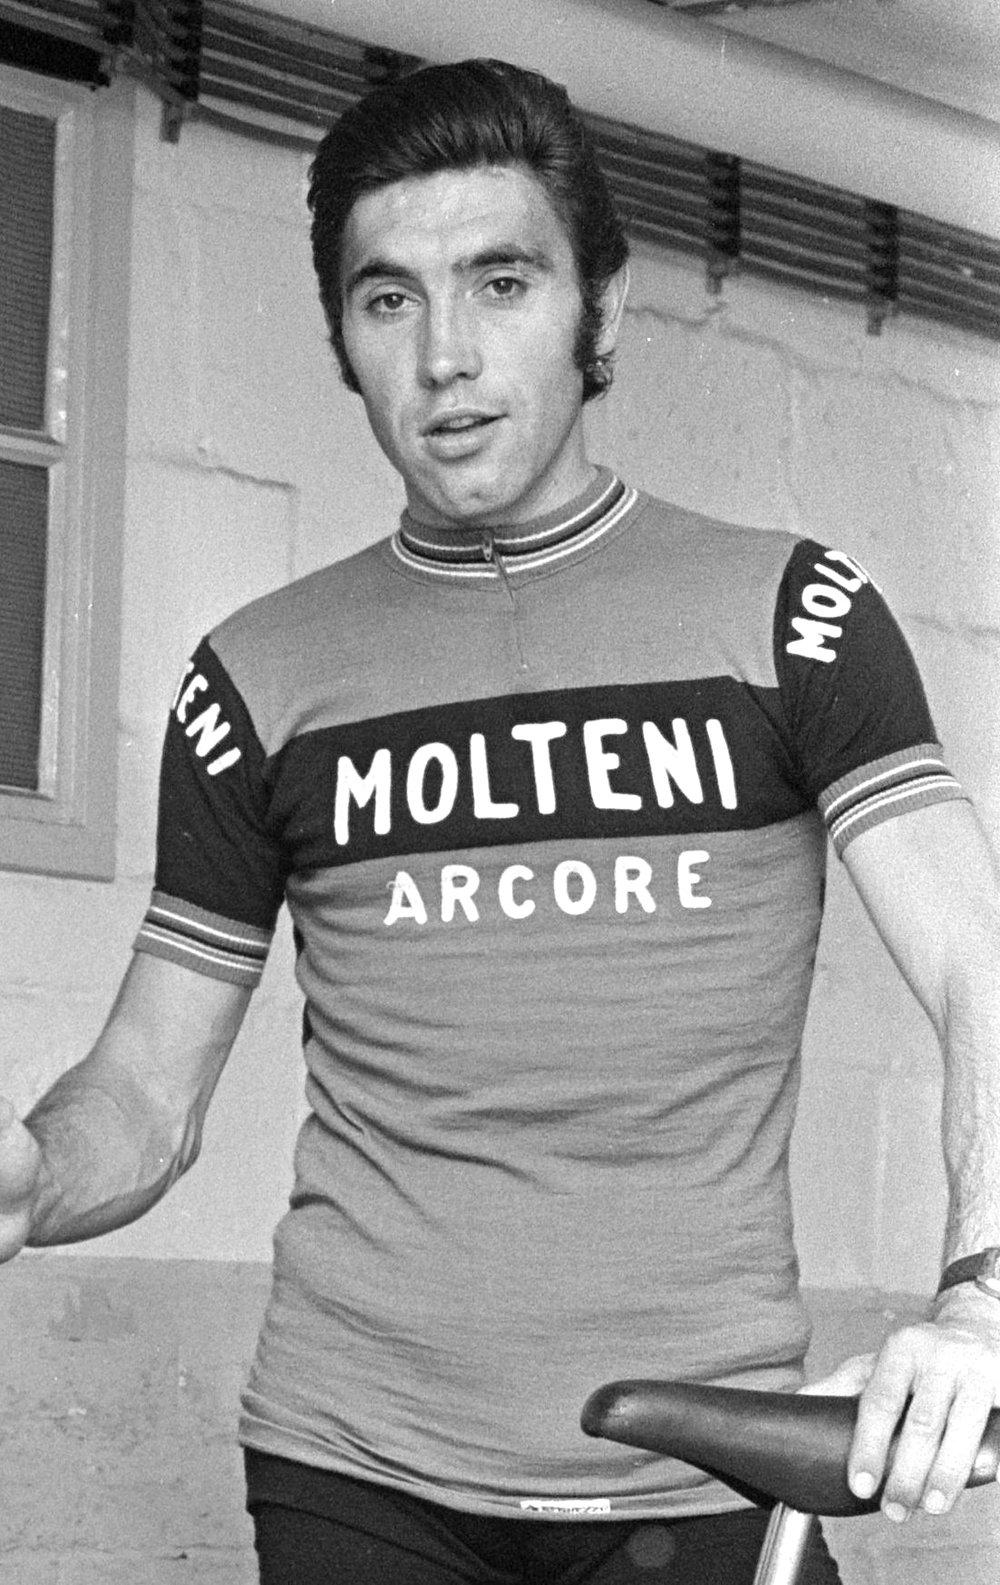 The great Eddy Merckx